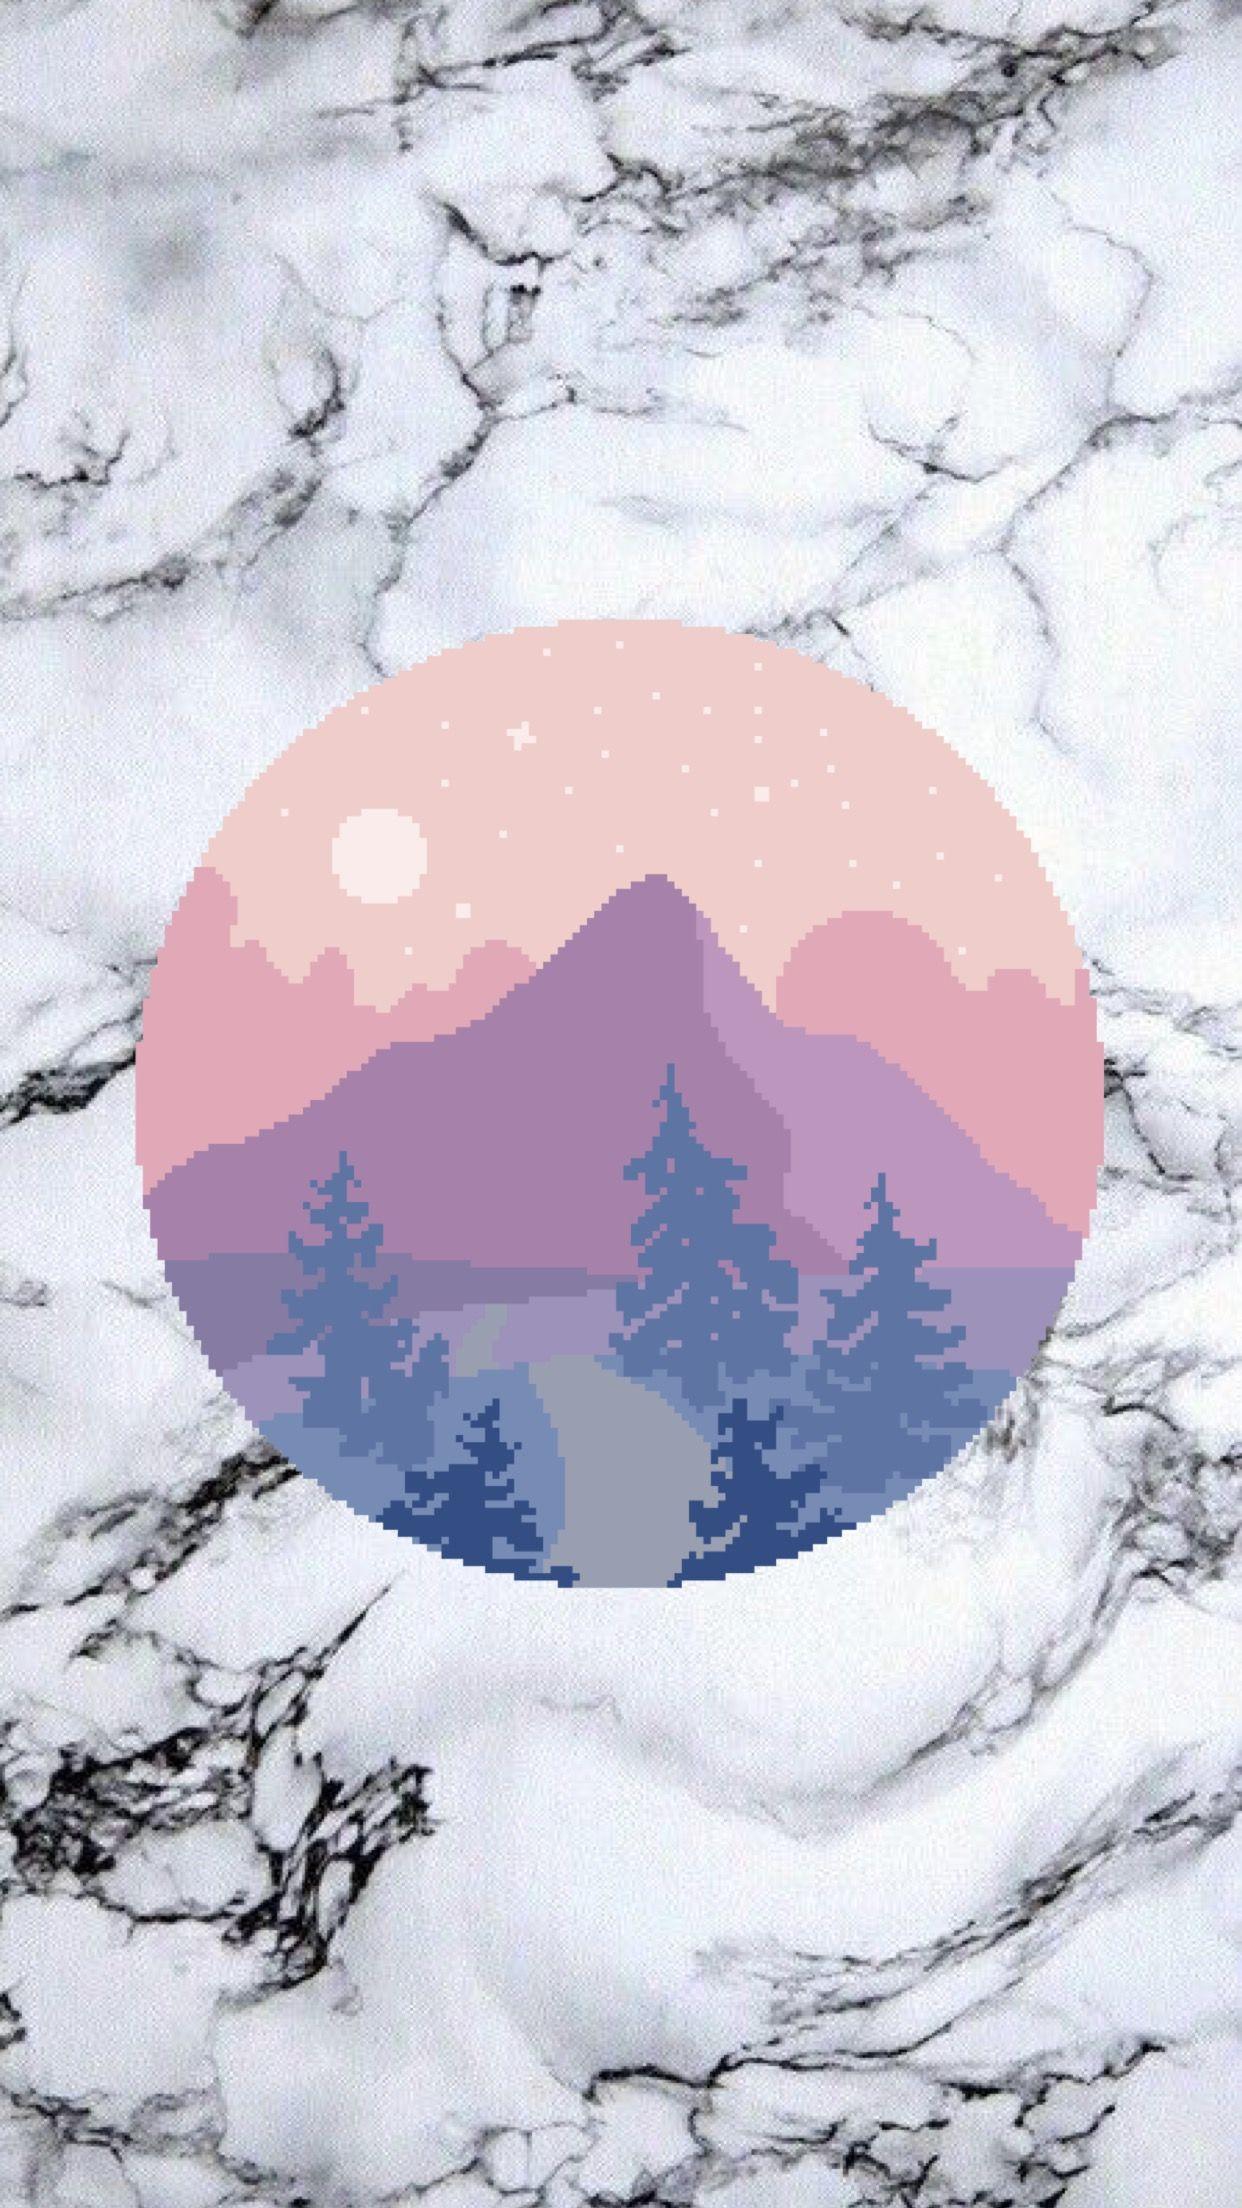 Moon mountain wallpaper  made by Laurette  instagram:@laurette_evonen  Wallpapers  Phone